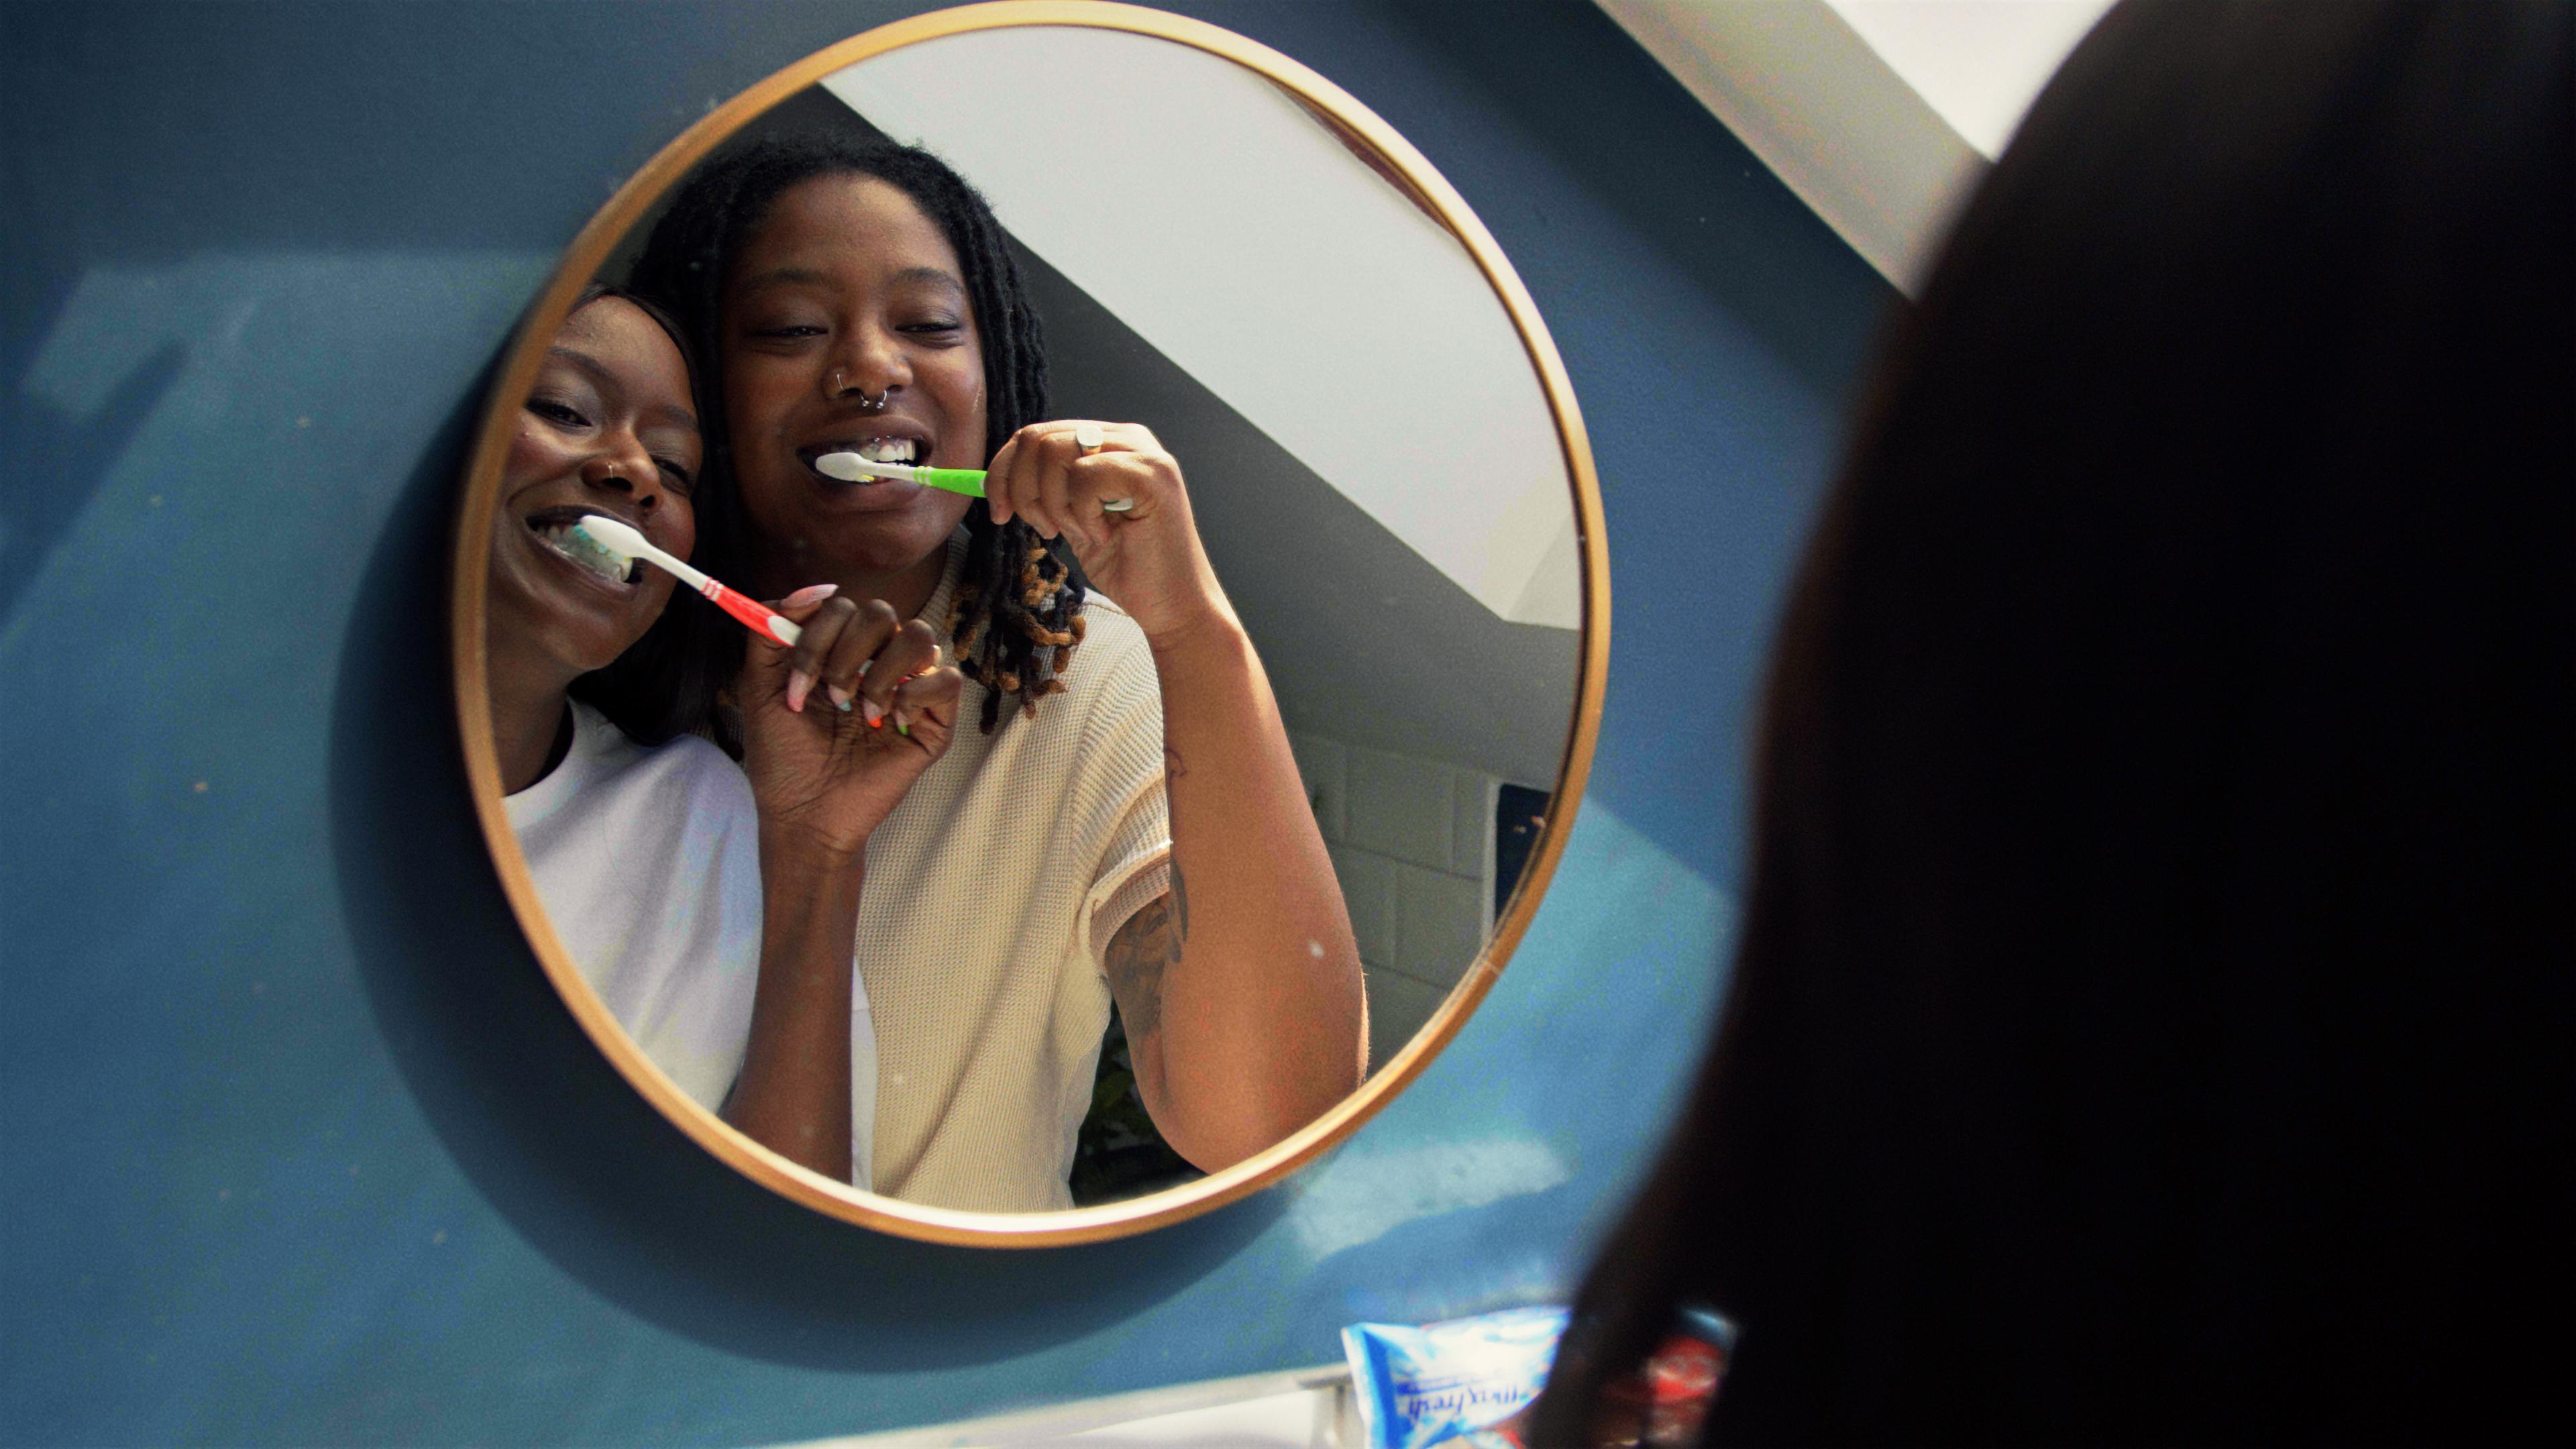 2 women brushing their teeth and smiling